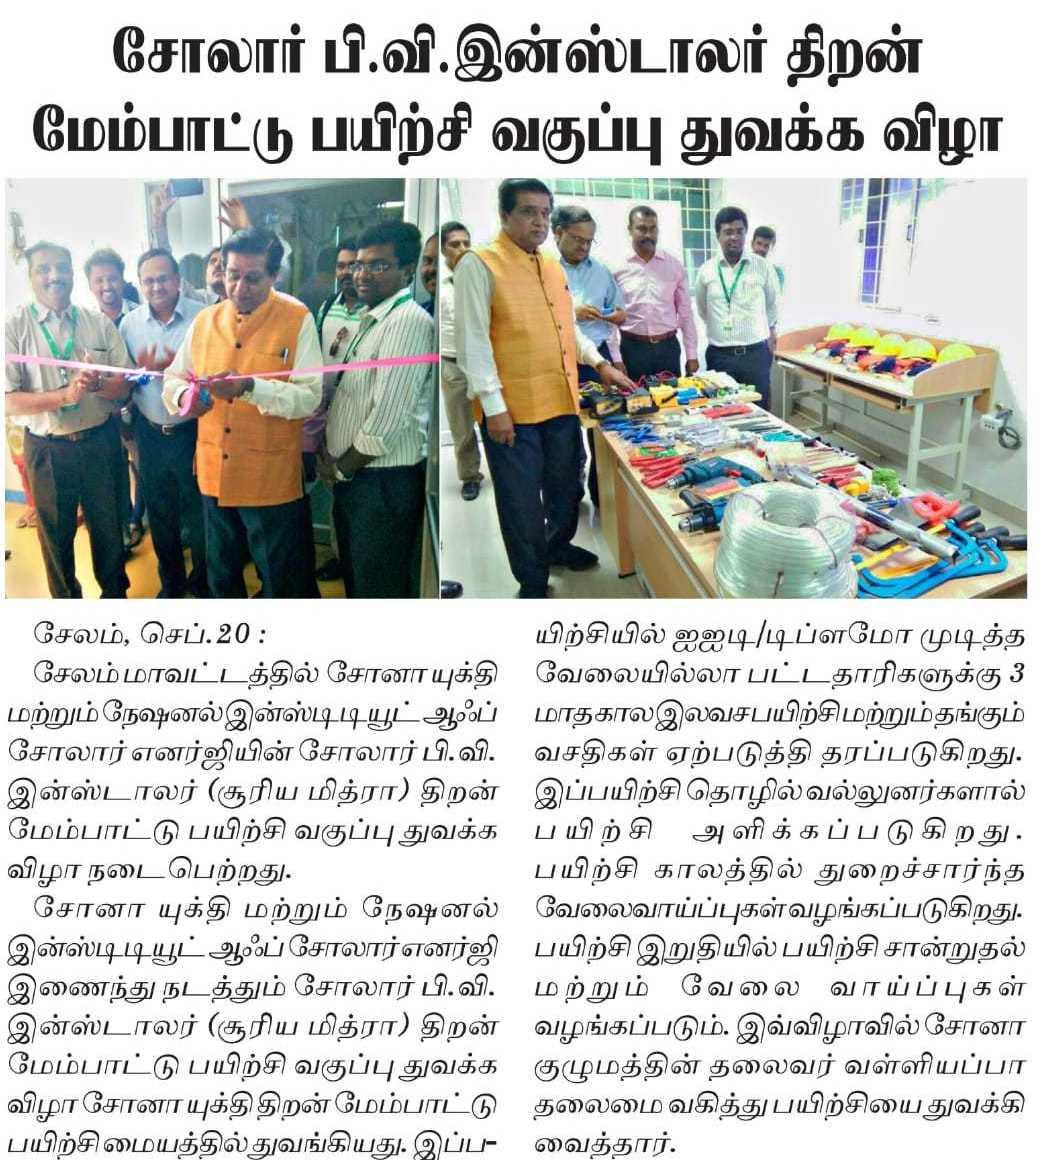 Suryamitra - Free Solar Training Inauguration at Salem Centre